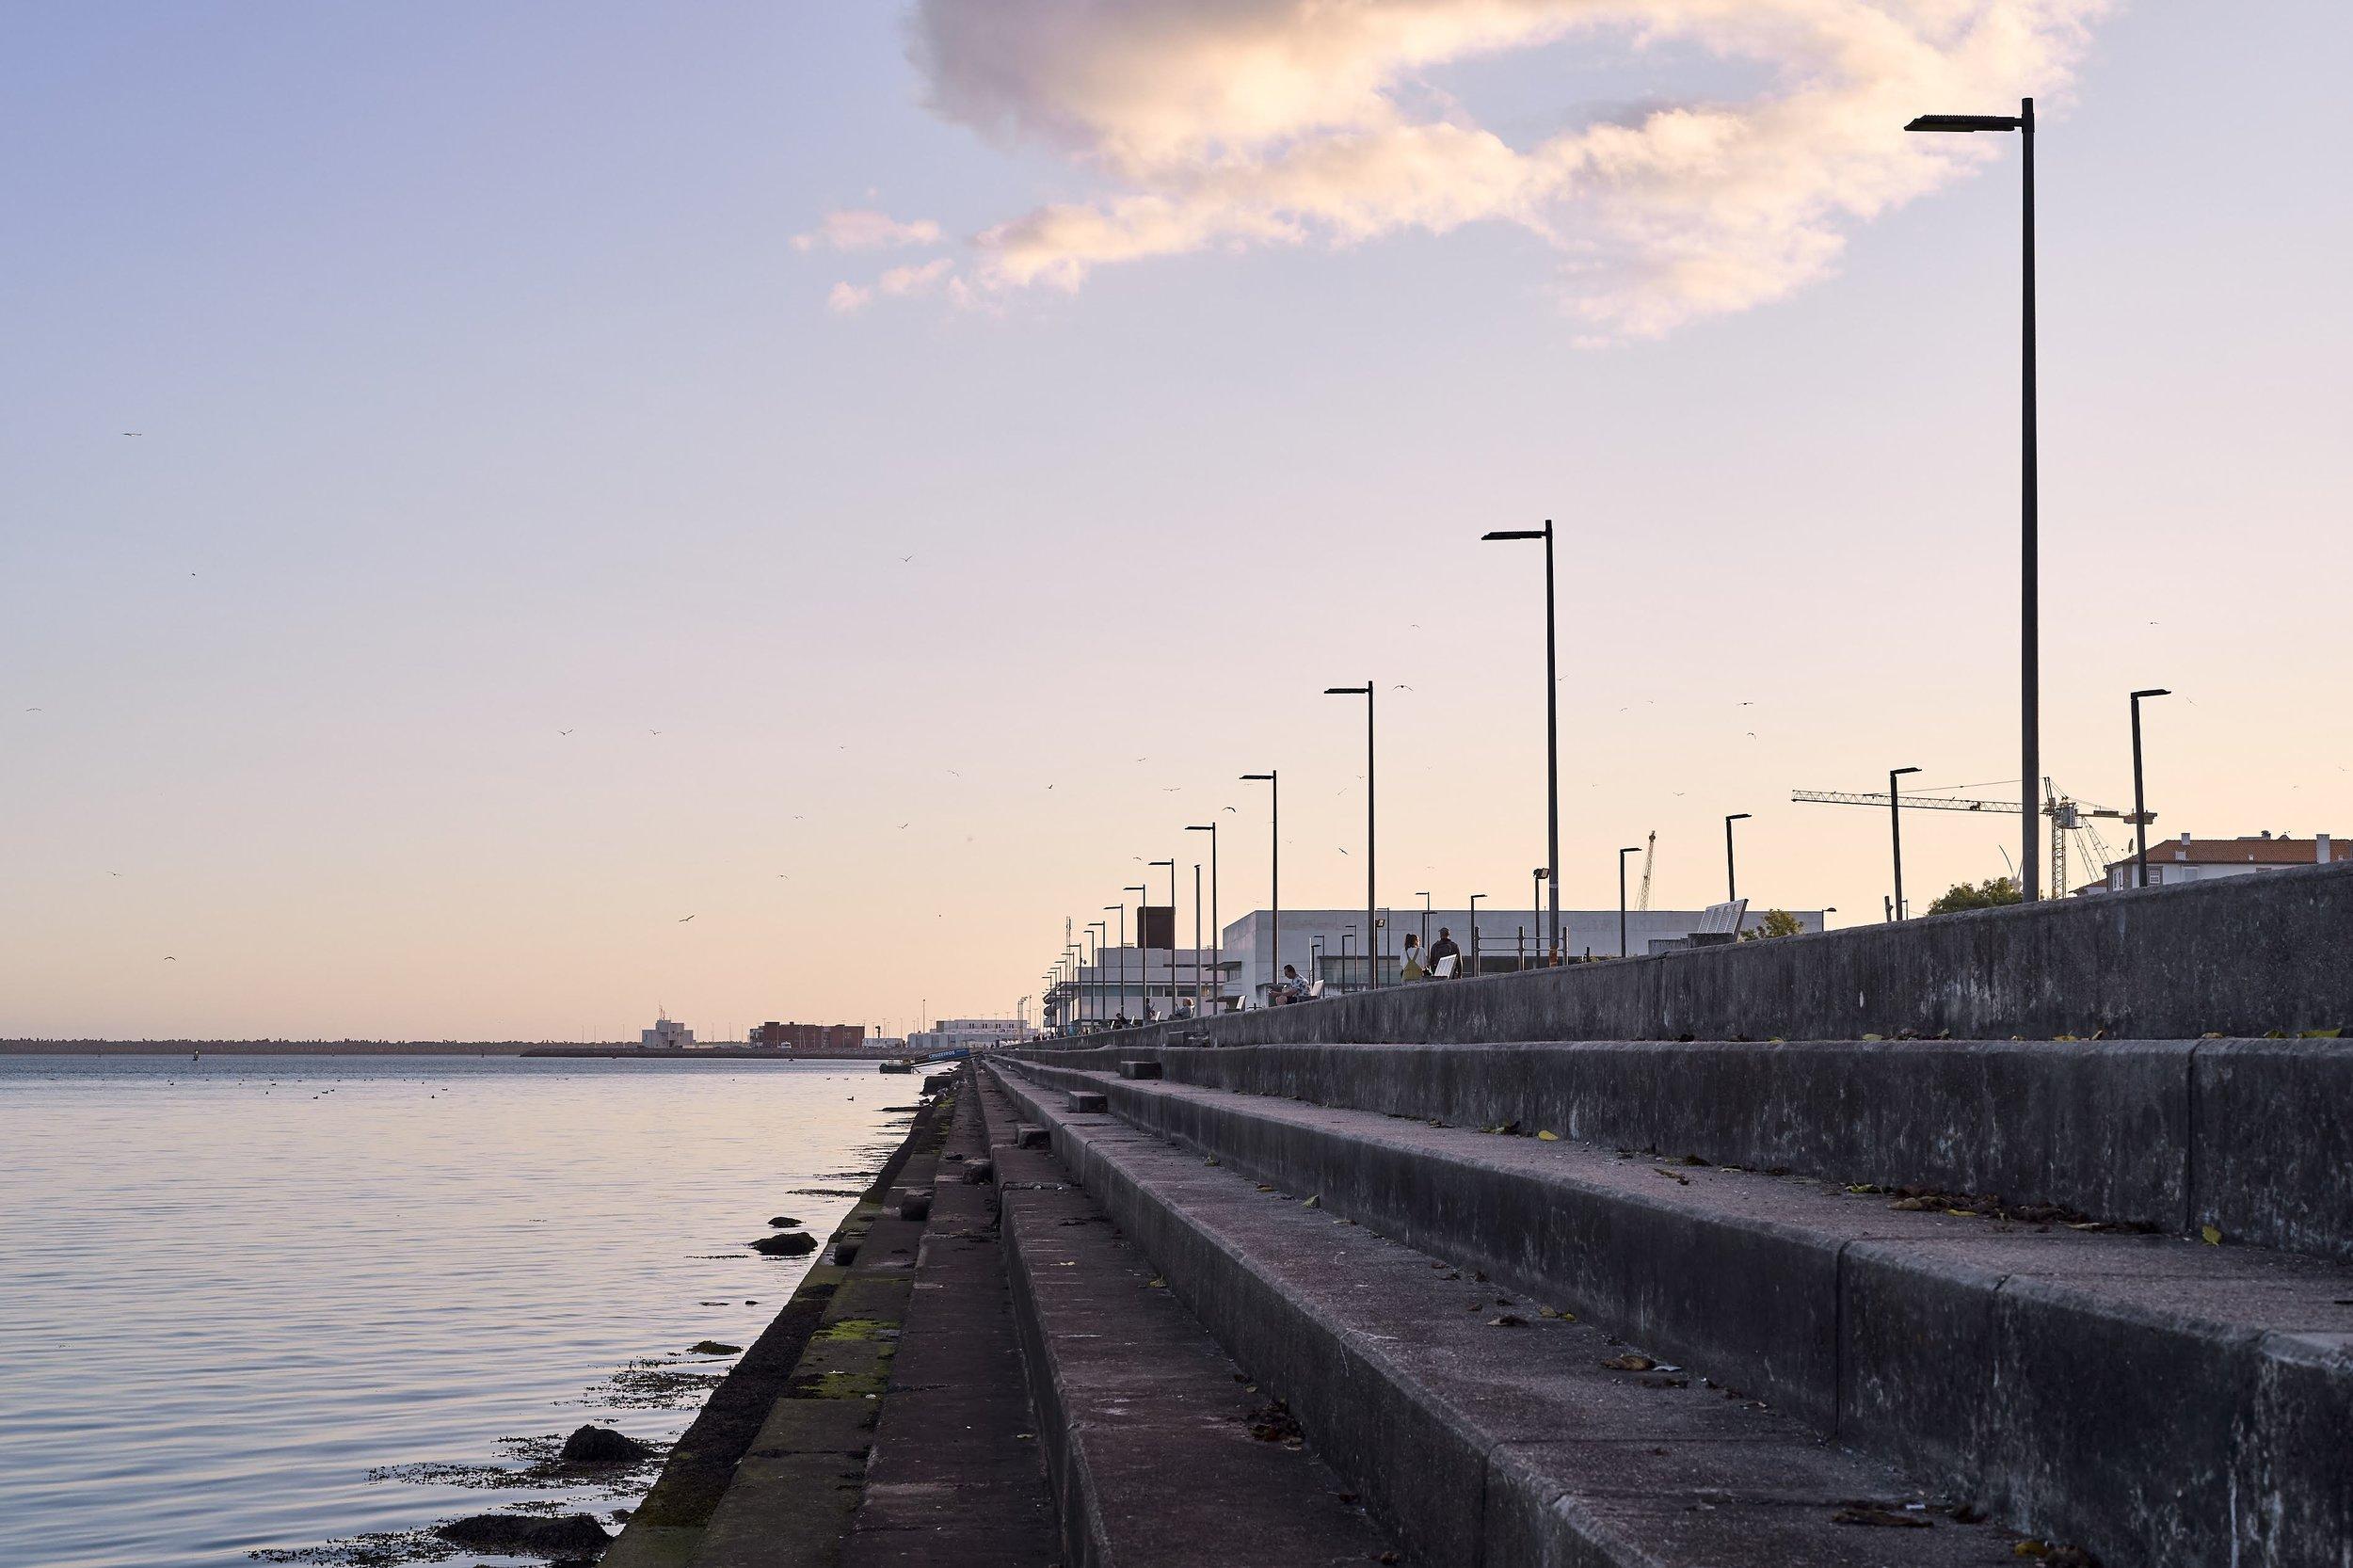 Viana do Castelo - Promenade on the Lima's eaching the ocean. - © Vincent Bridenne